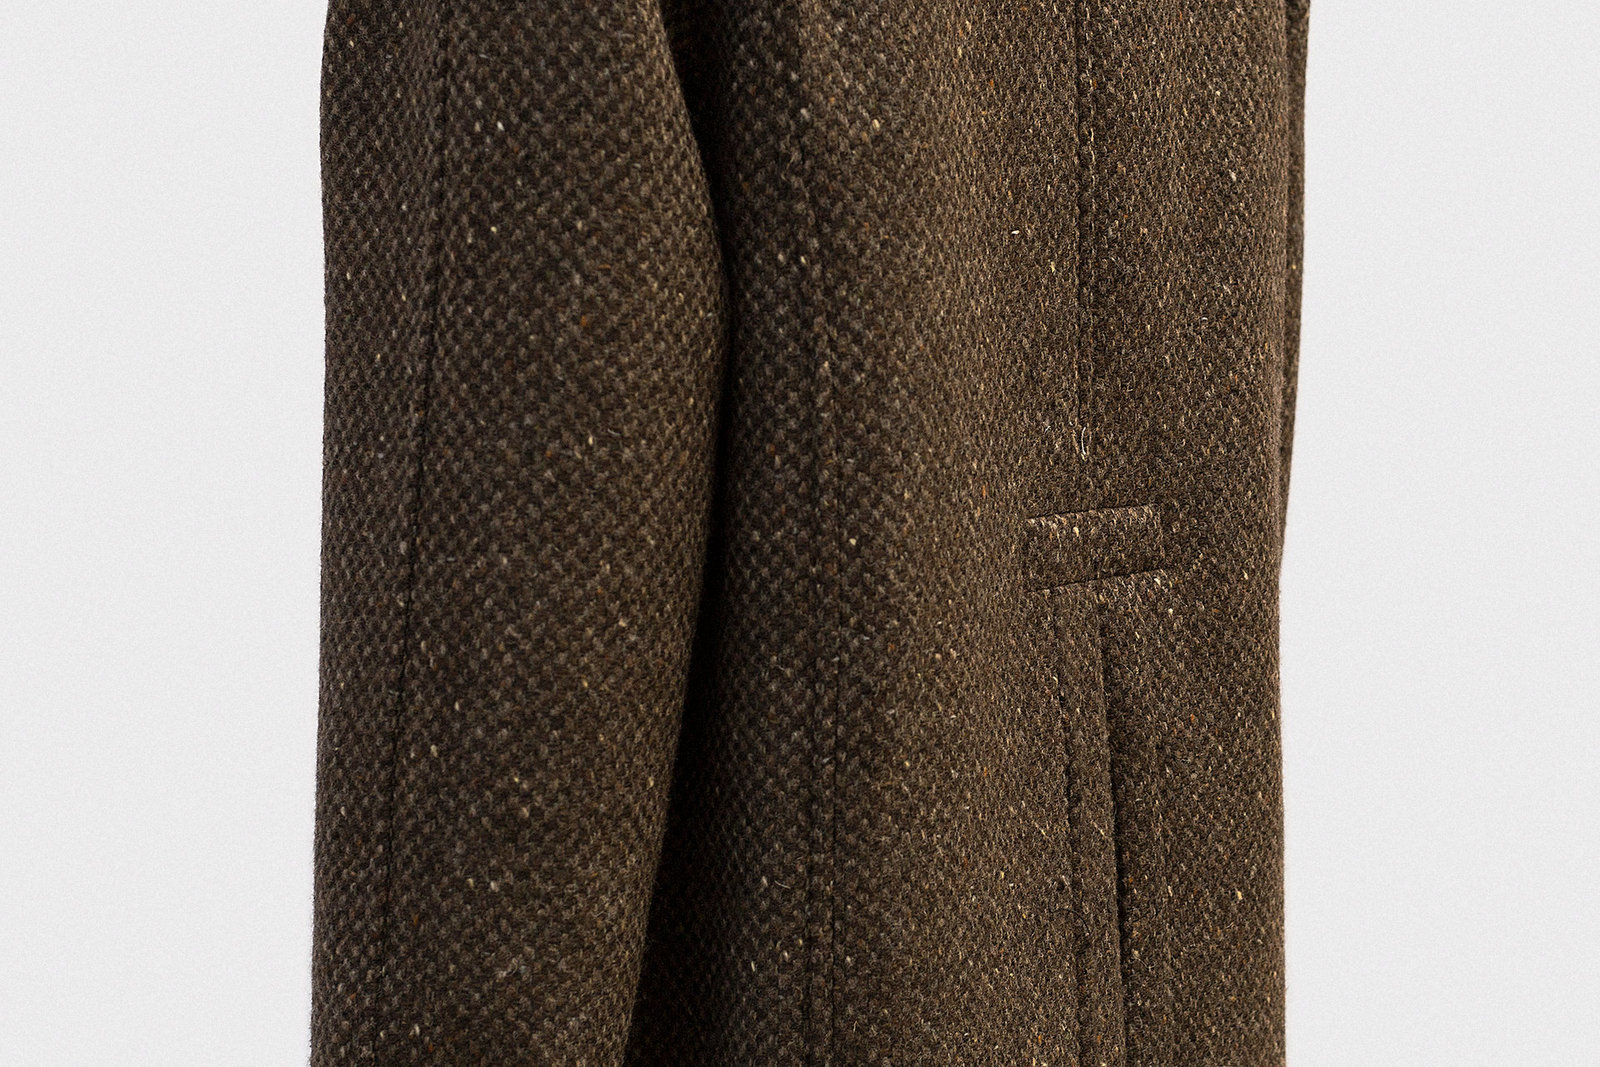 balmacaan-donegal-barleycorn-tweed-brown-8@2x.jpeg